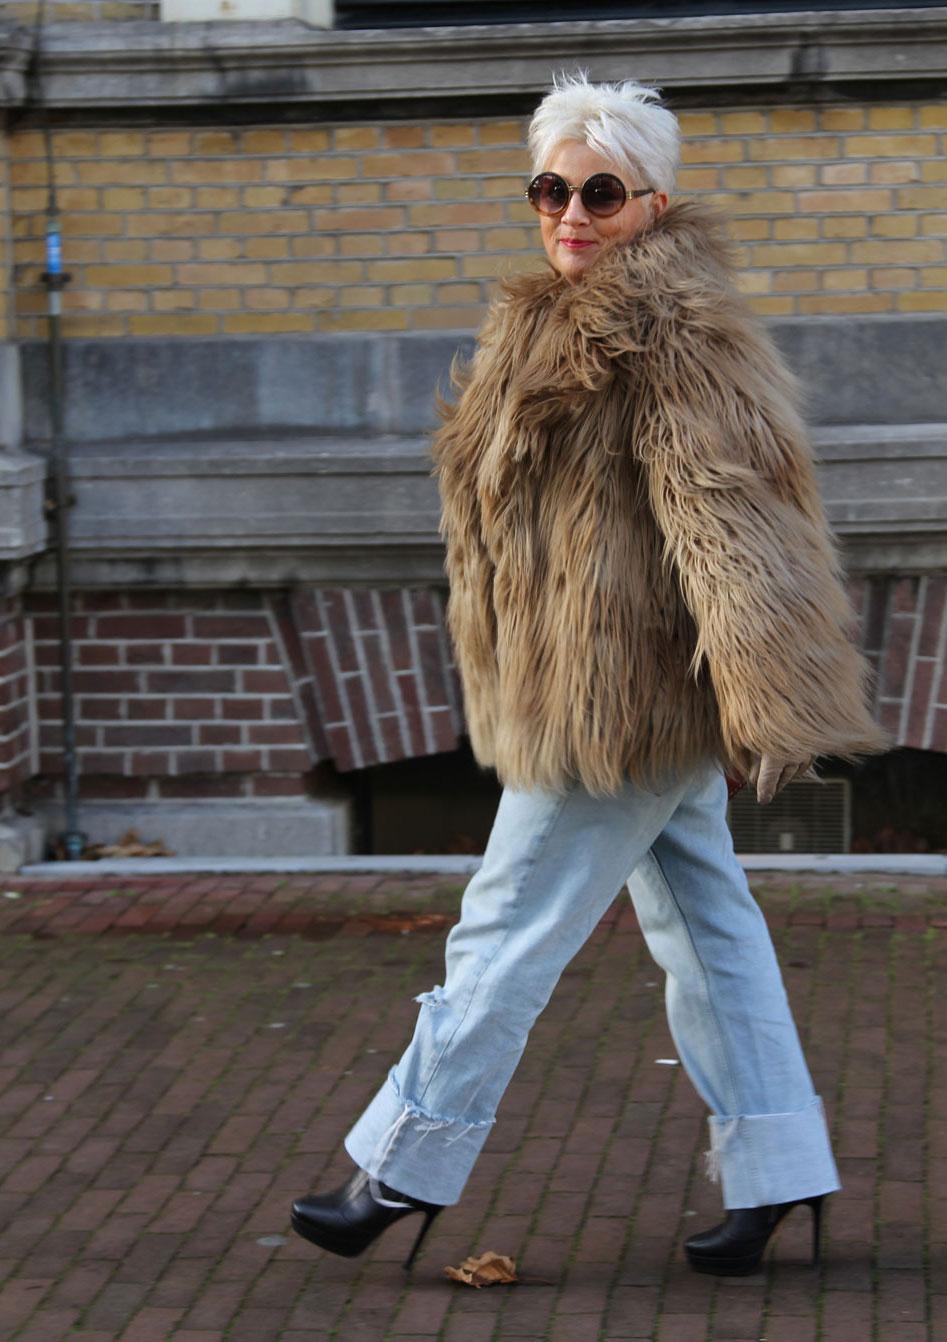 straatfotografie in Amsterdam